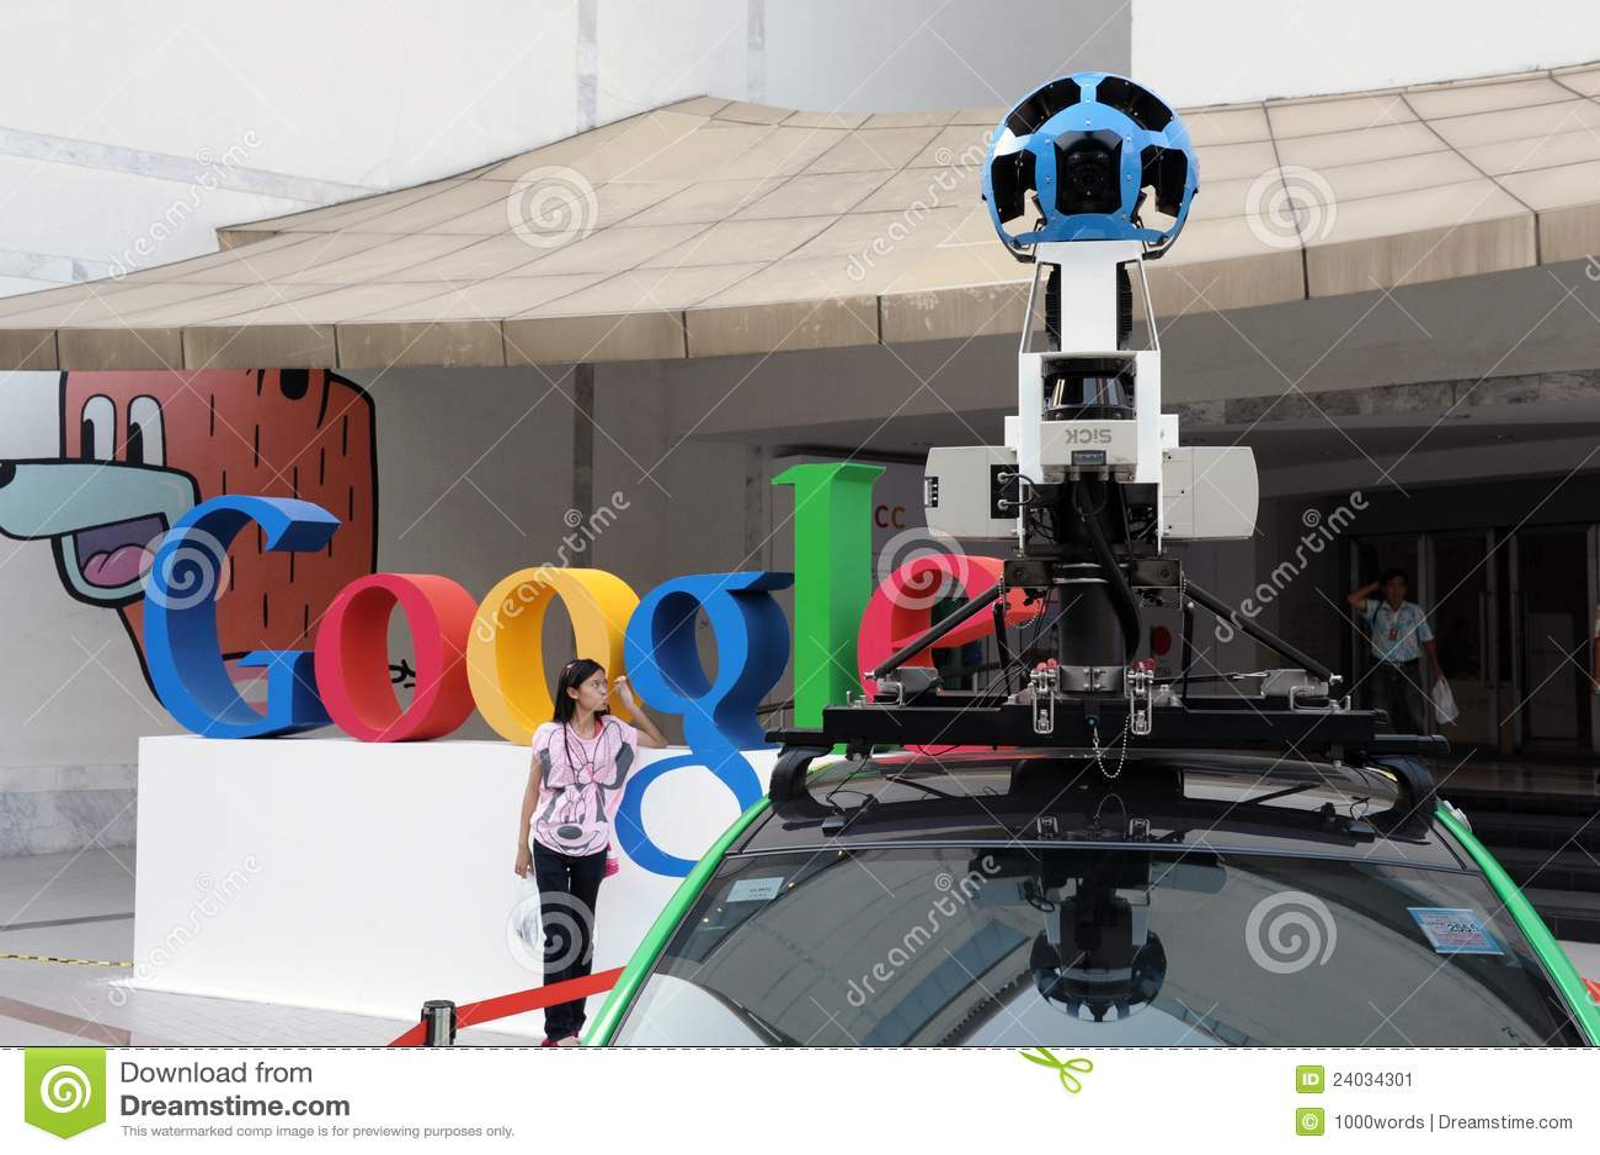 Google Maps Car In Bangkok Editorial Photo - Image: 24034301